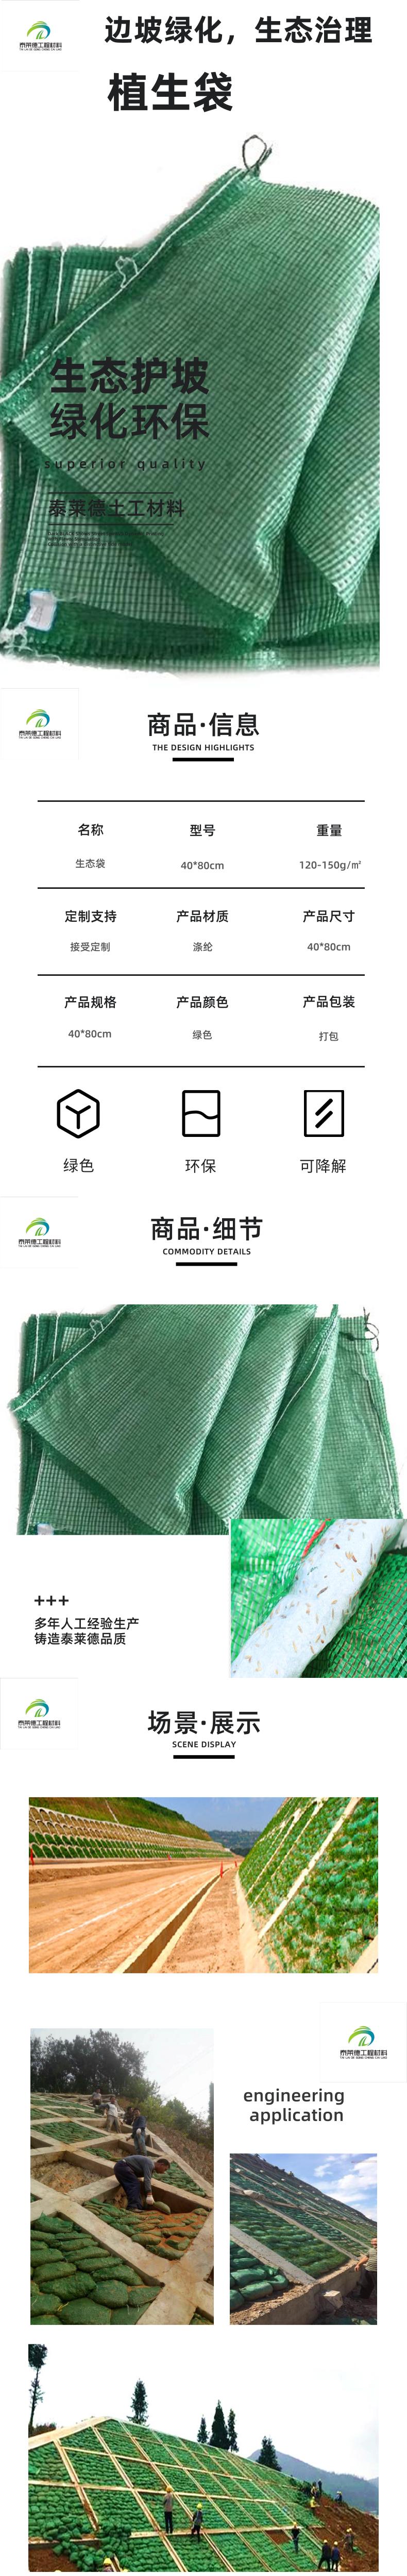 植生袋1616.png